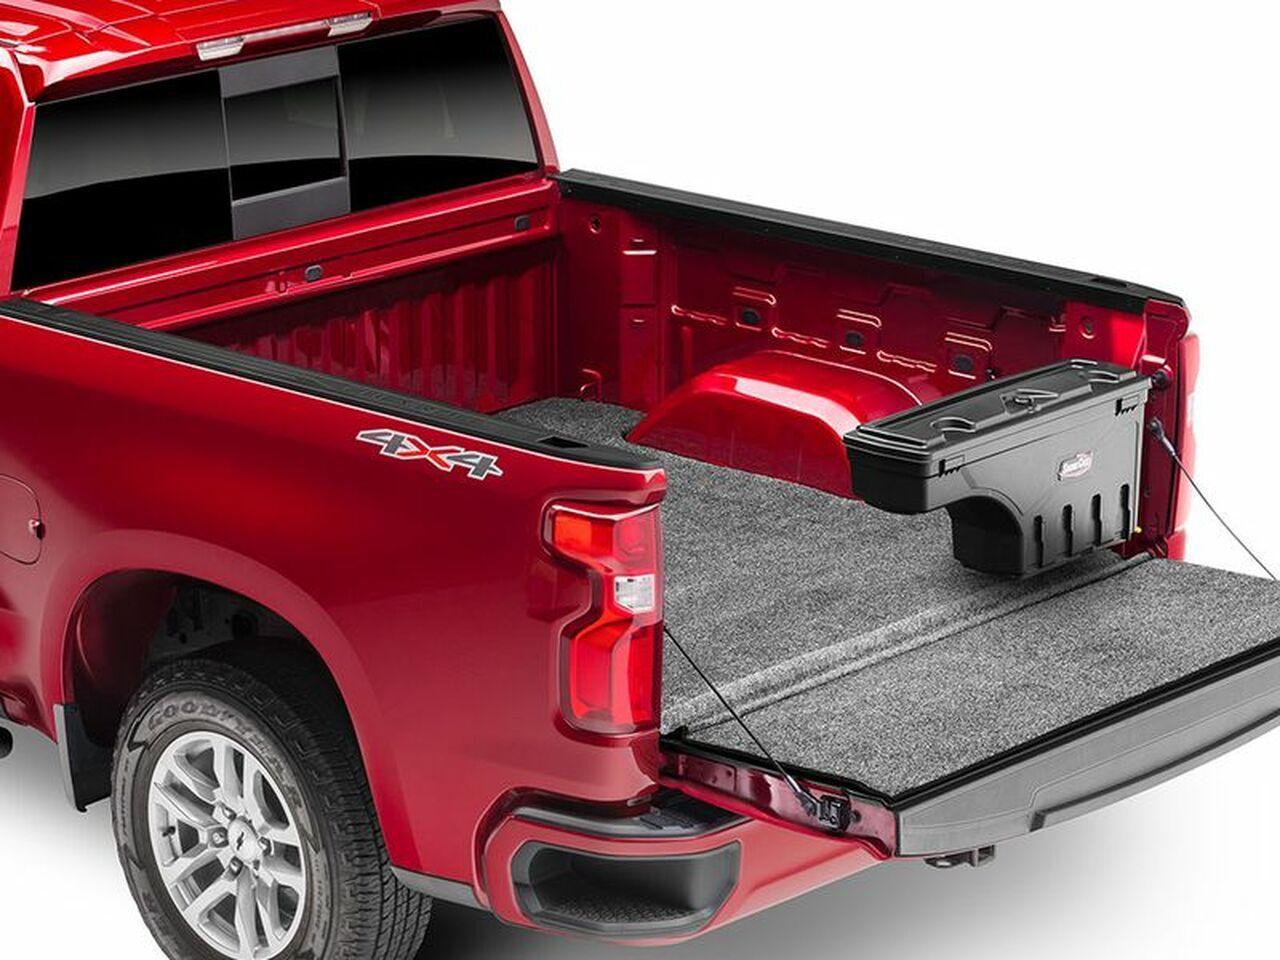 Undercover Swingcase SC104P 2019 to 2021 Chevrolet Silverado/GMC Sierra 1500 Passenger Side